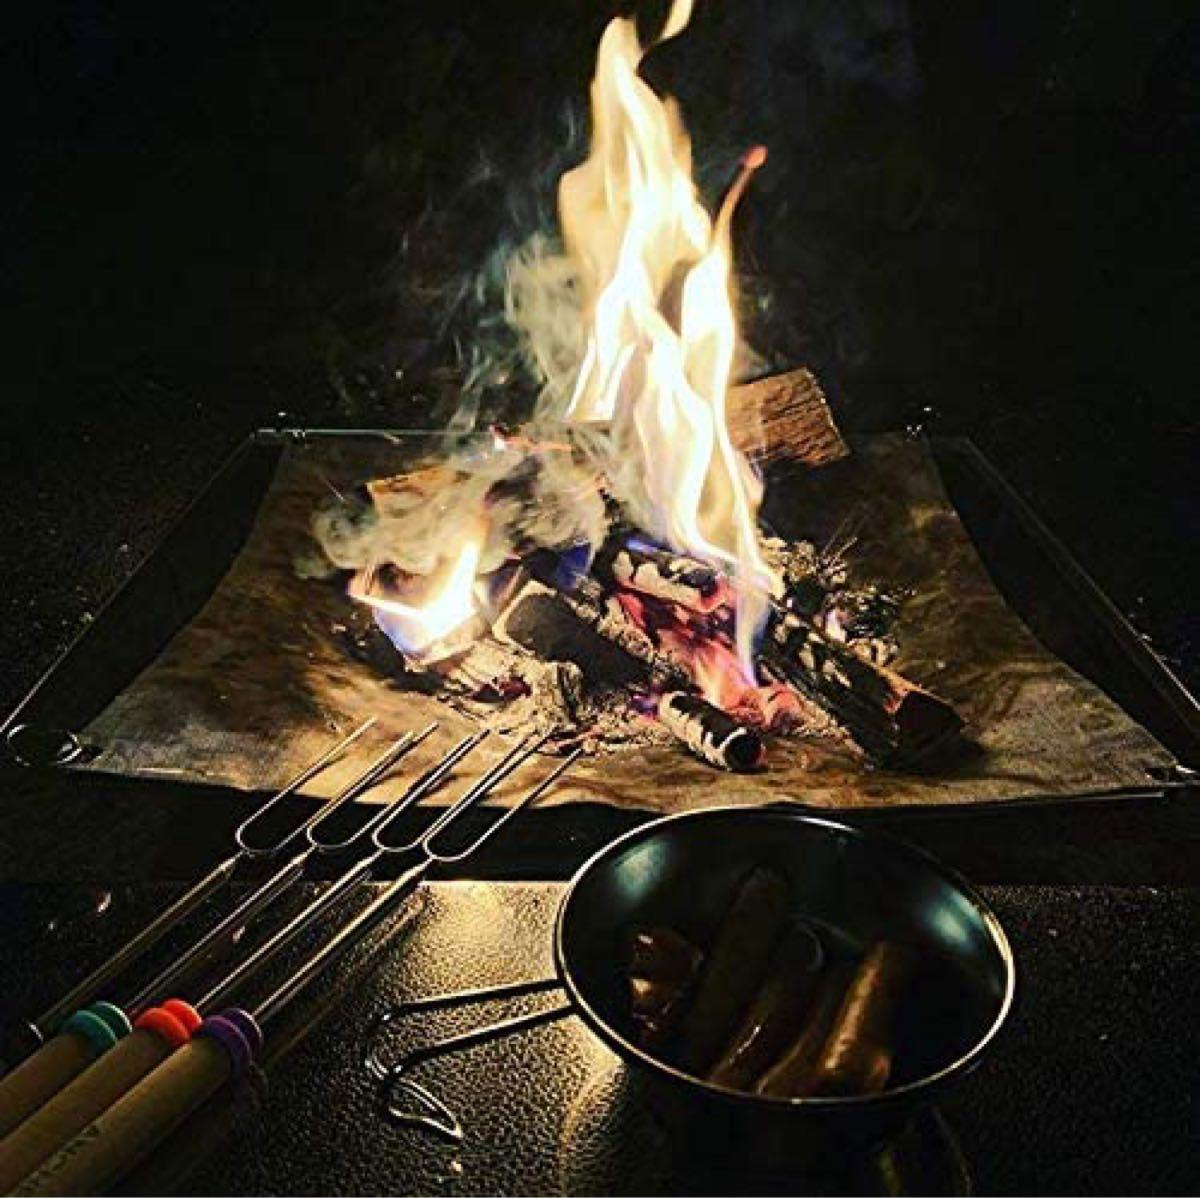 CAMPING MOON キャンピングムーンT500 ファイアープレイステーブル 囲炉裏テーブル ファイアーガード 焚火テーブル